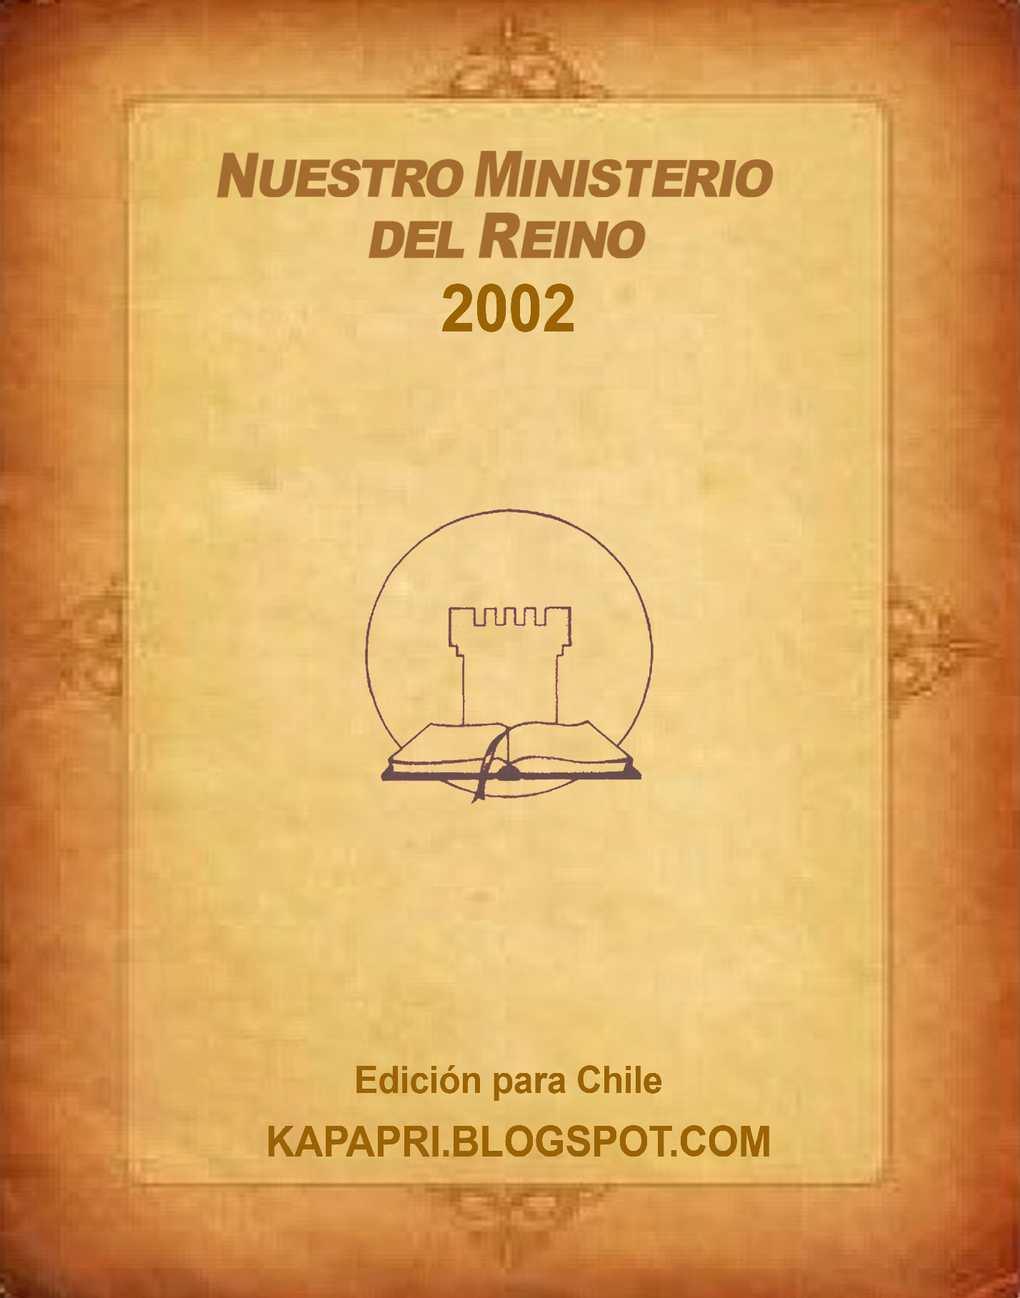 Calaméo - 2002 Nuestro Ministerio del Reino